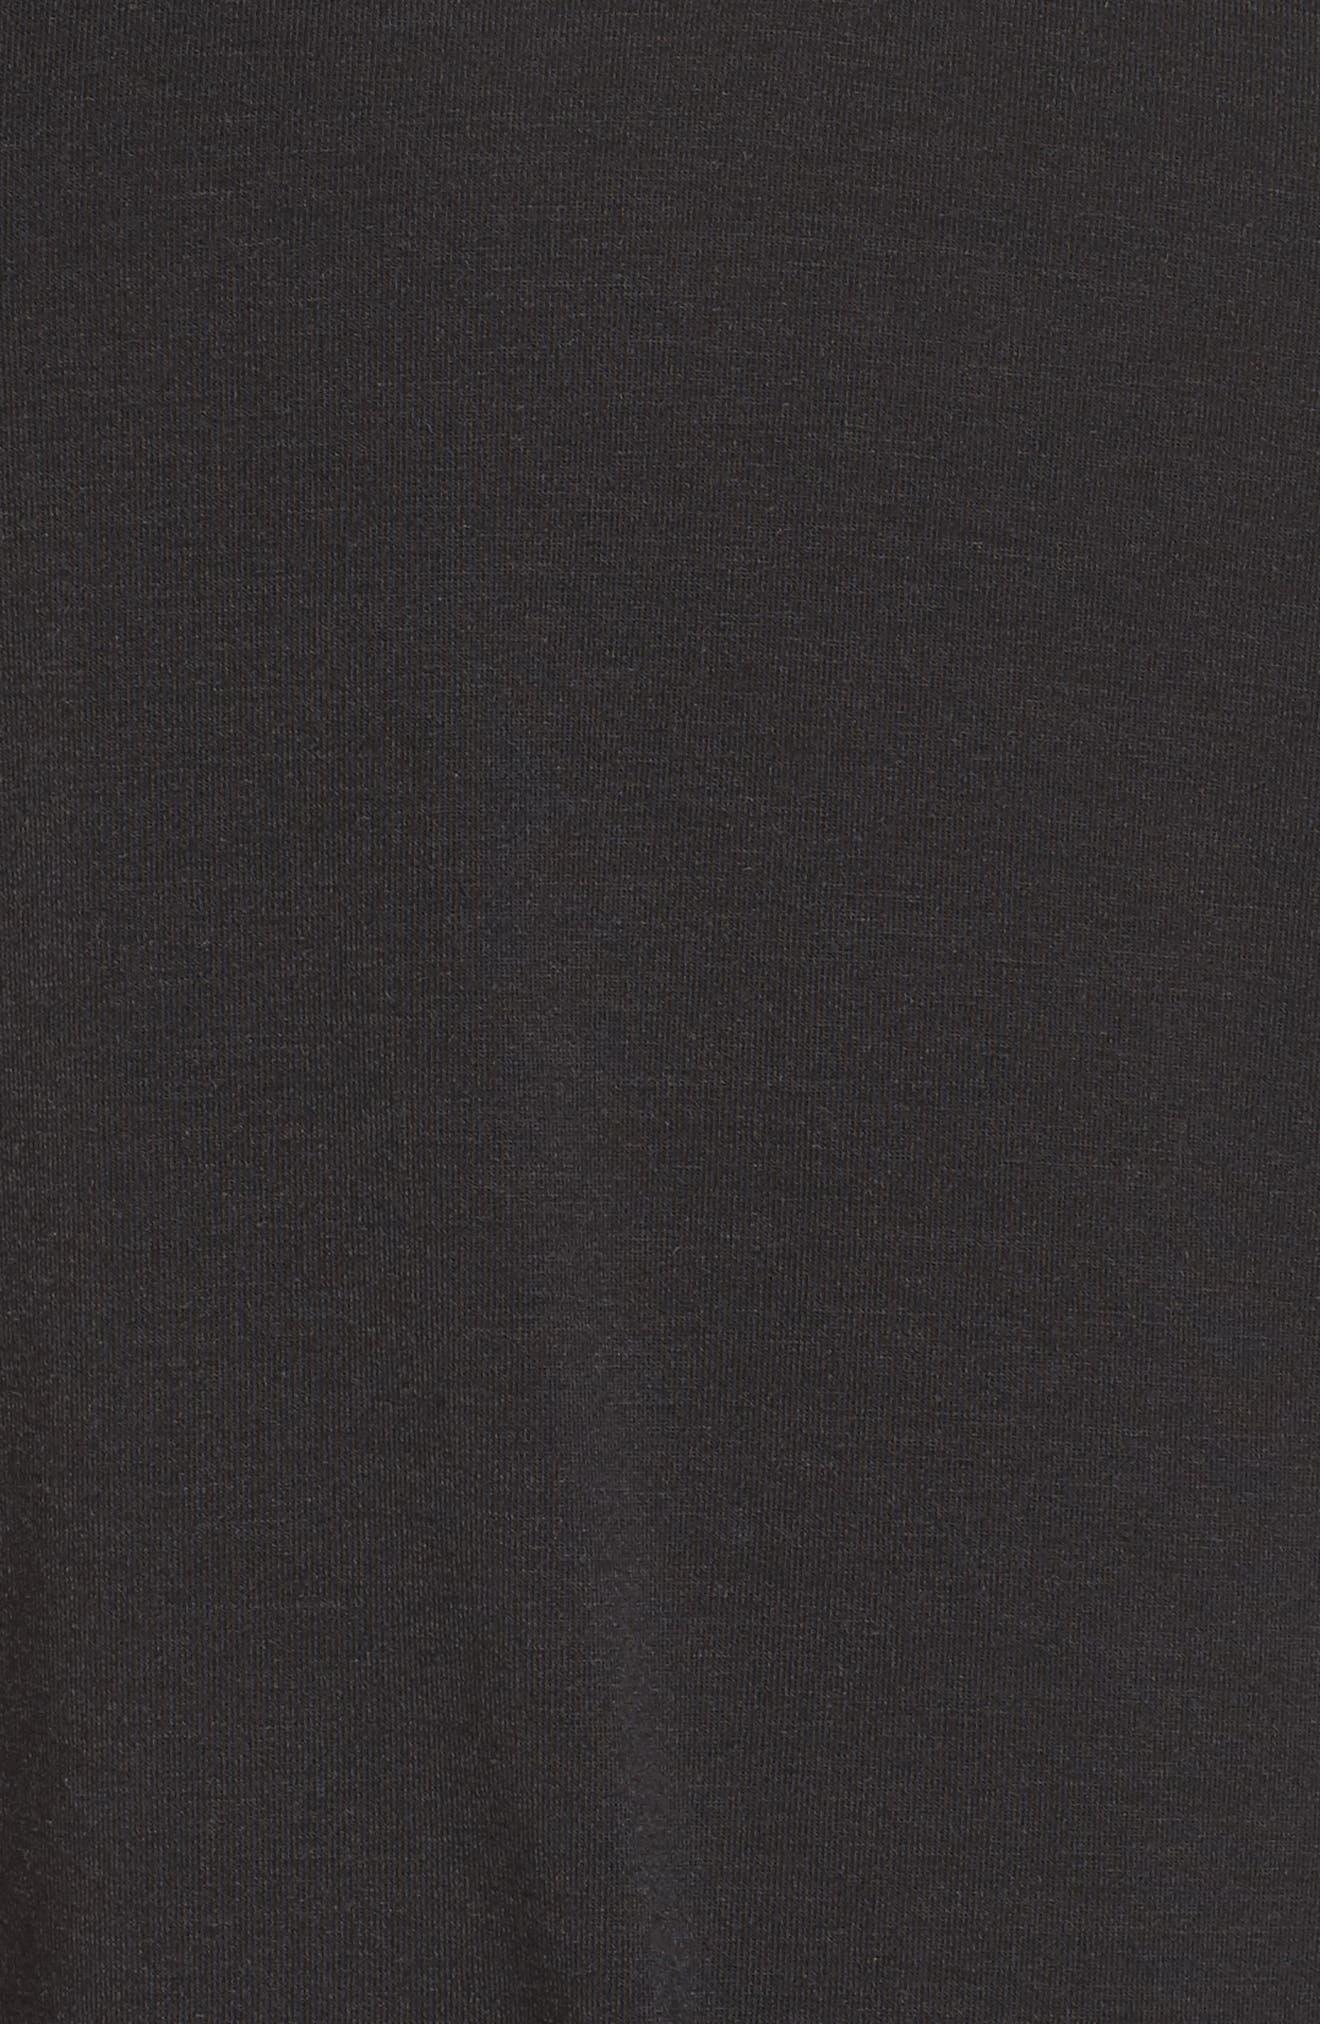 Ava Tee,                             Alternate thumbnail 6, color,                             BLACK